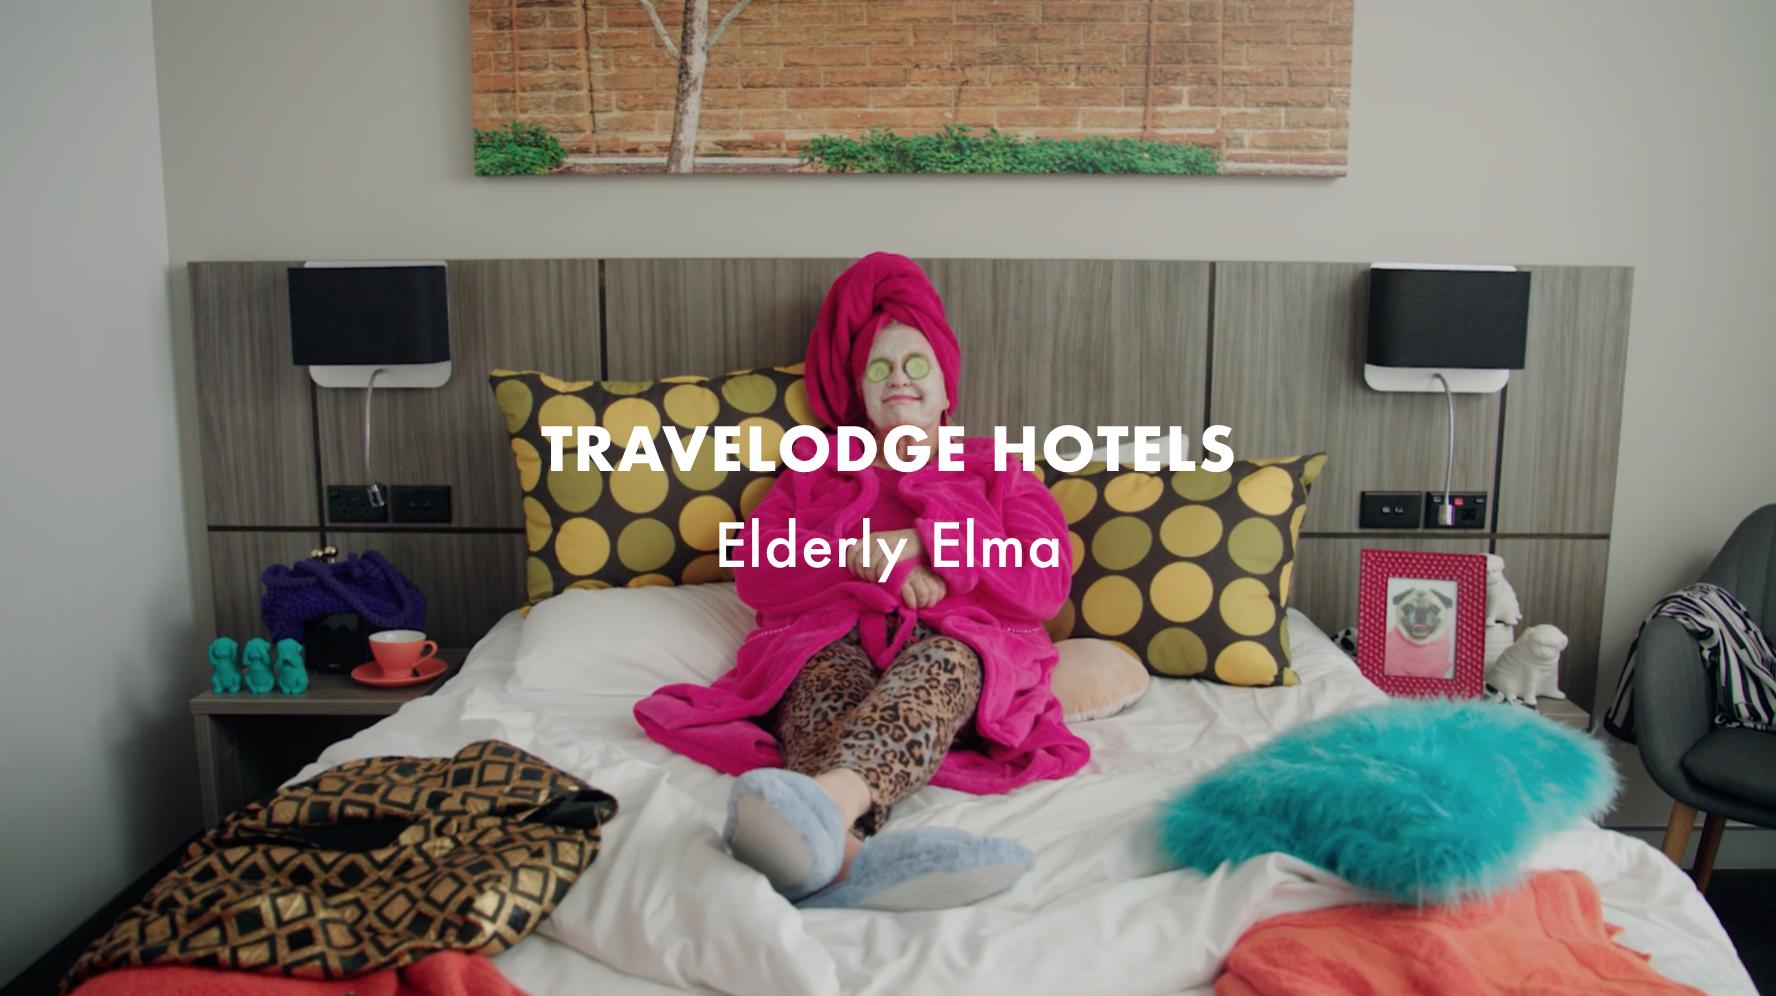 Travelodge Hotels - Elderly Elma